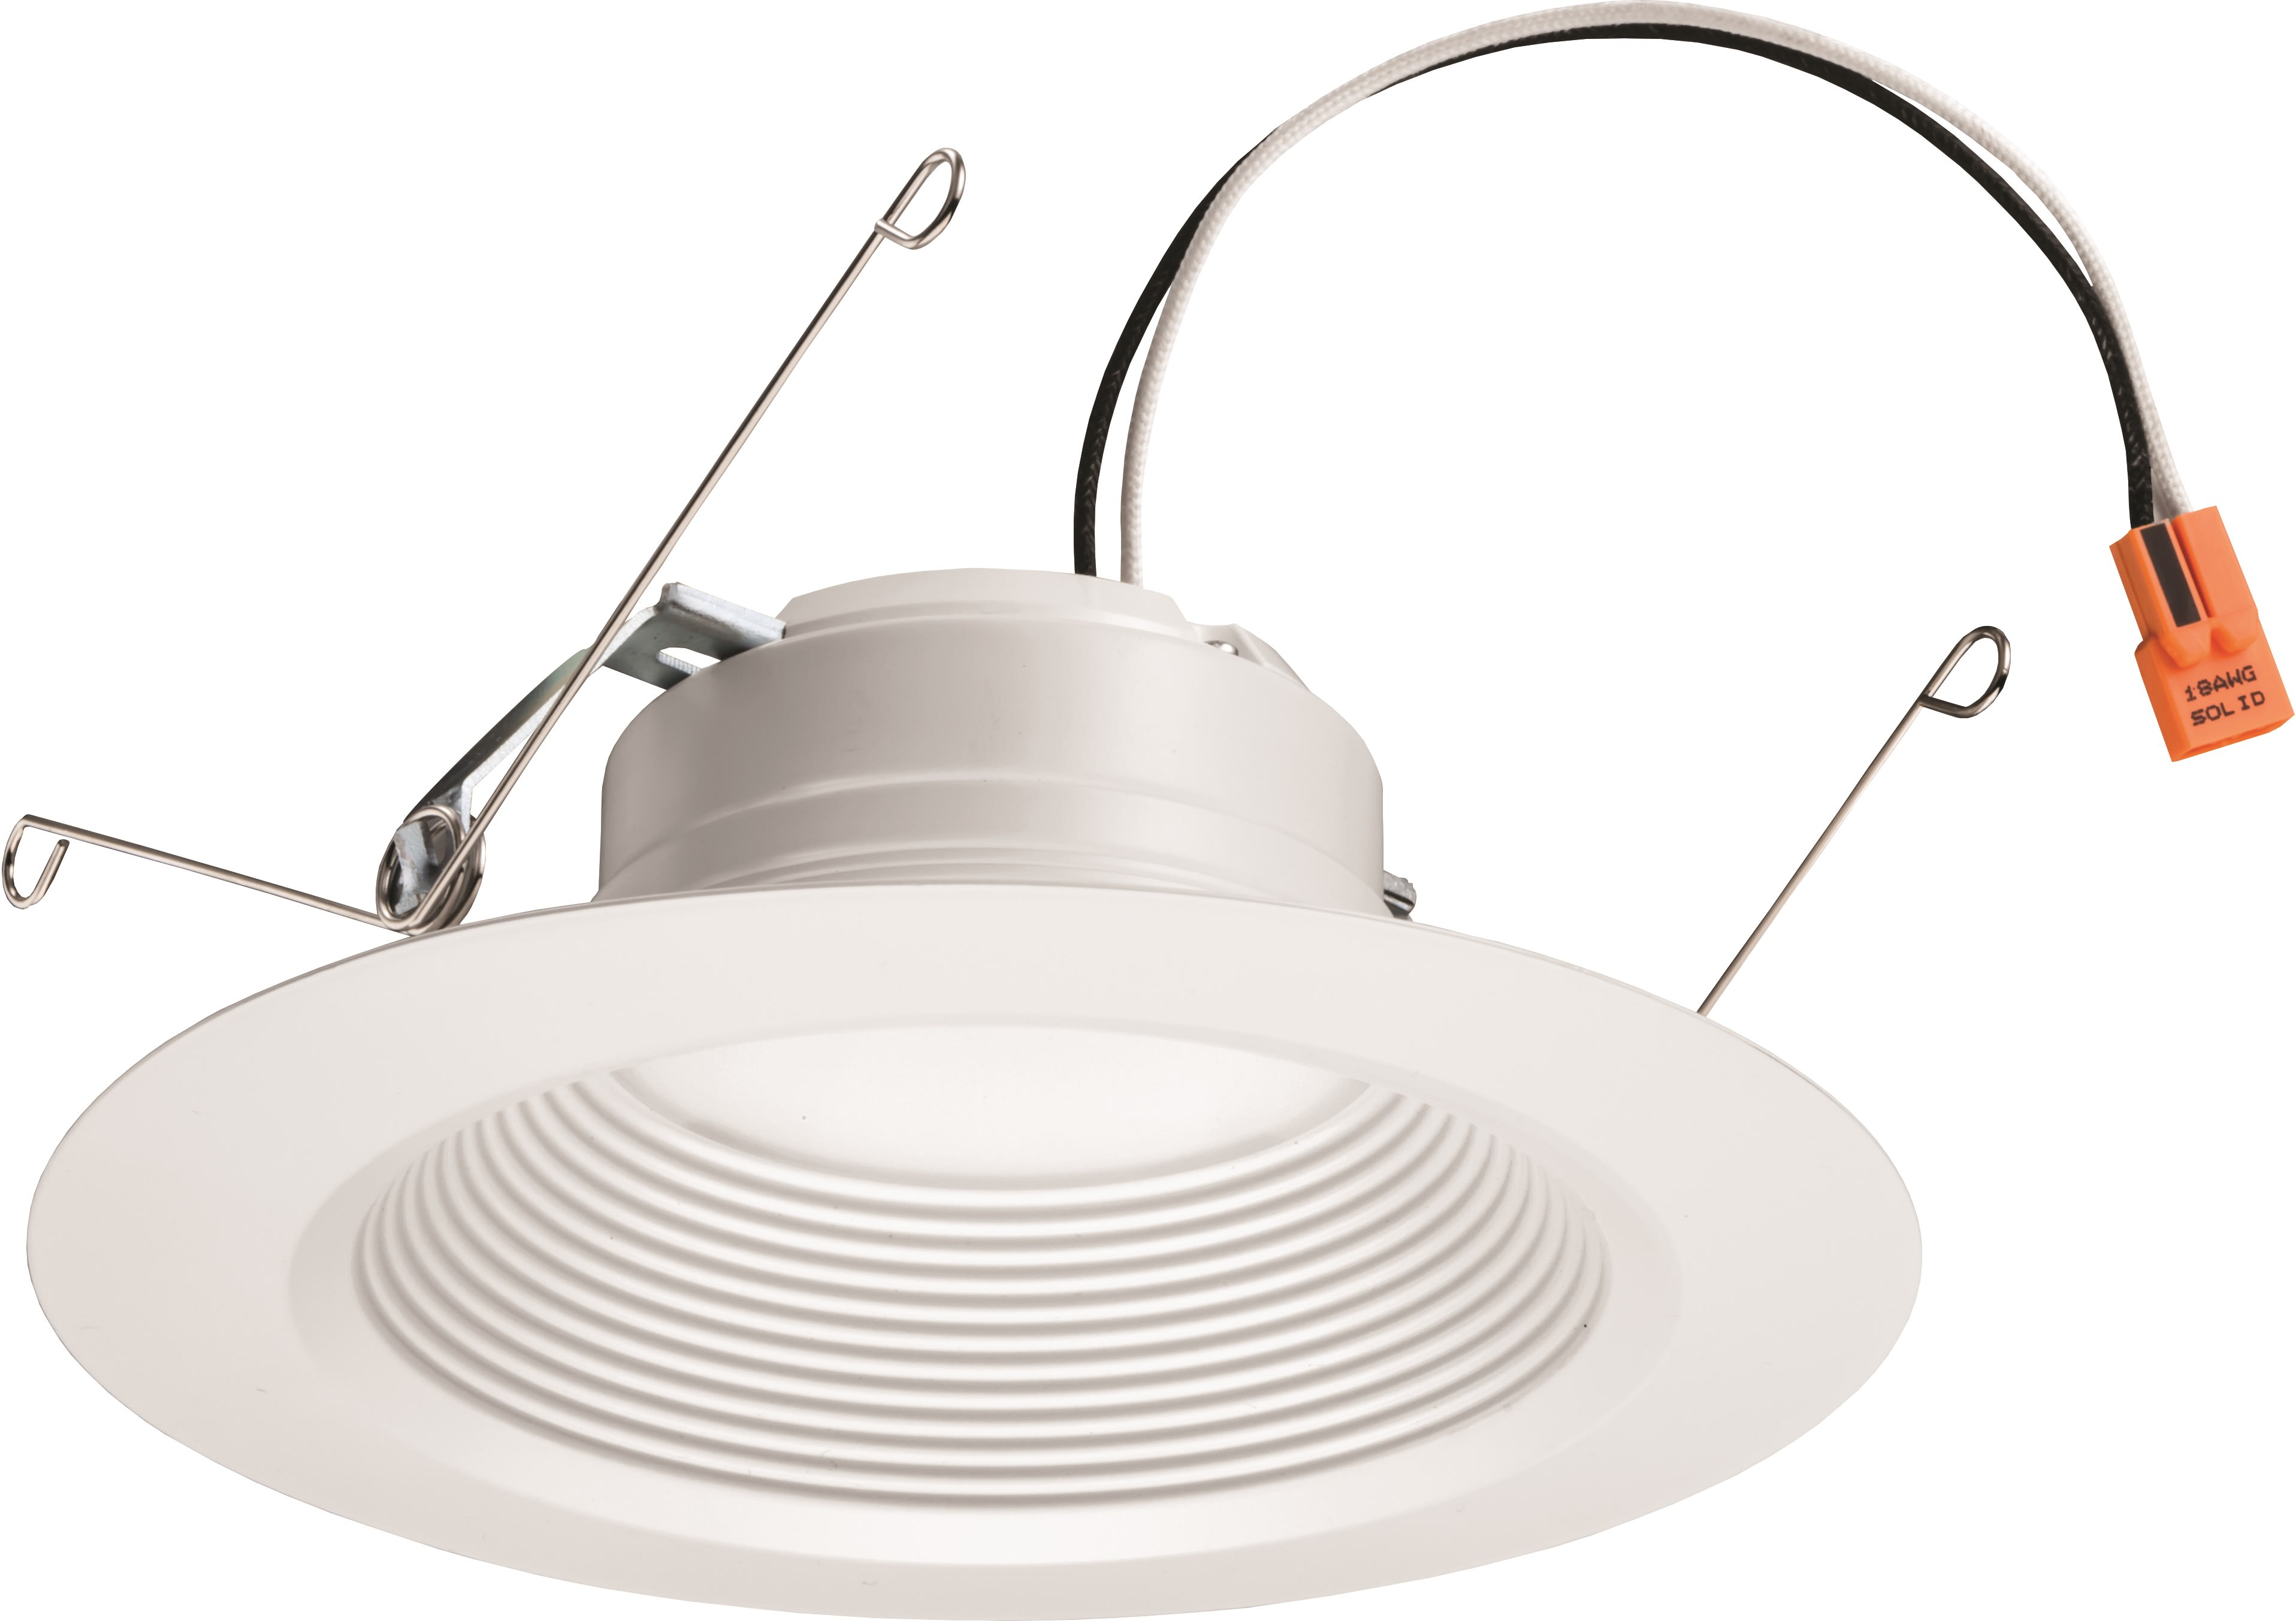 Lithonia Lighting 65bemw Led 30k 90cri M6 Matte White 3000k E Series Recessed 5 6 Led Ic Rated Baffle Trim Lightingdirect Com